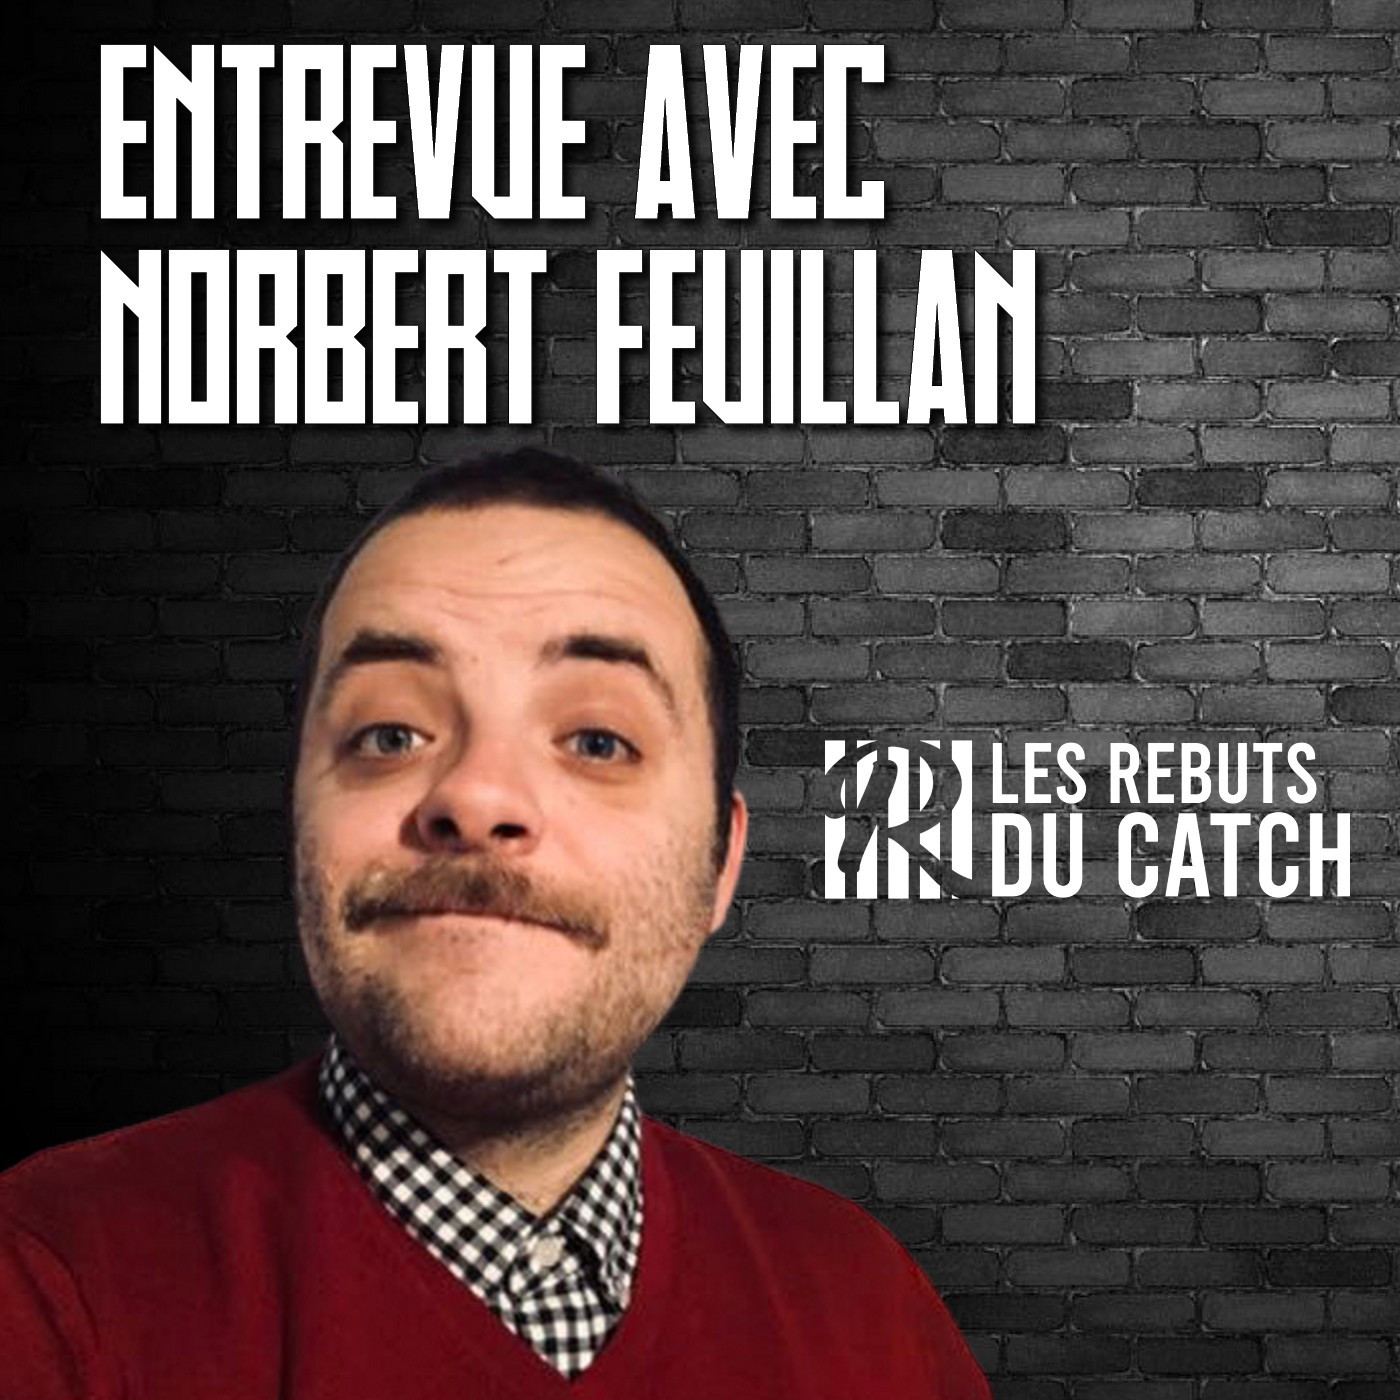 Entrevue avec Norbert Feuillan ( Commentateur - Streamer - Podcaster)